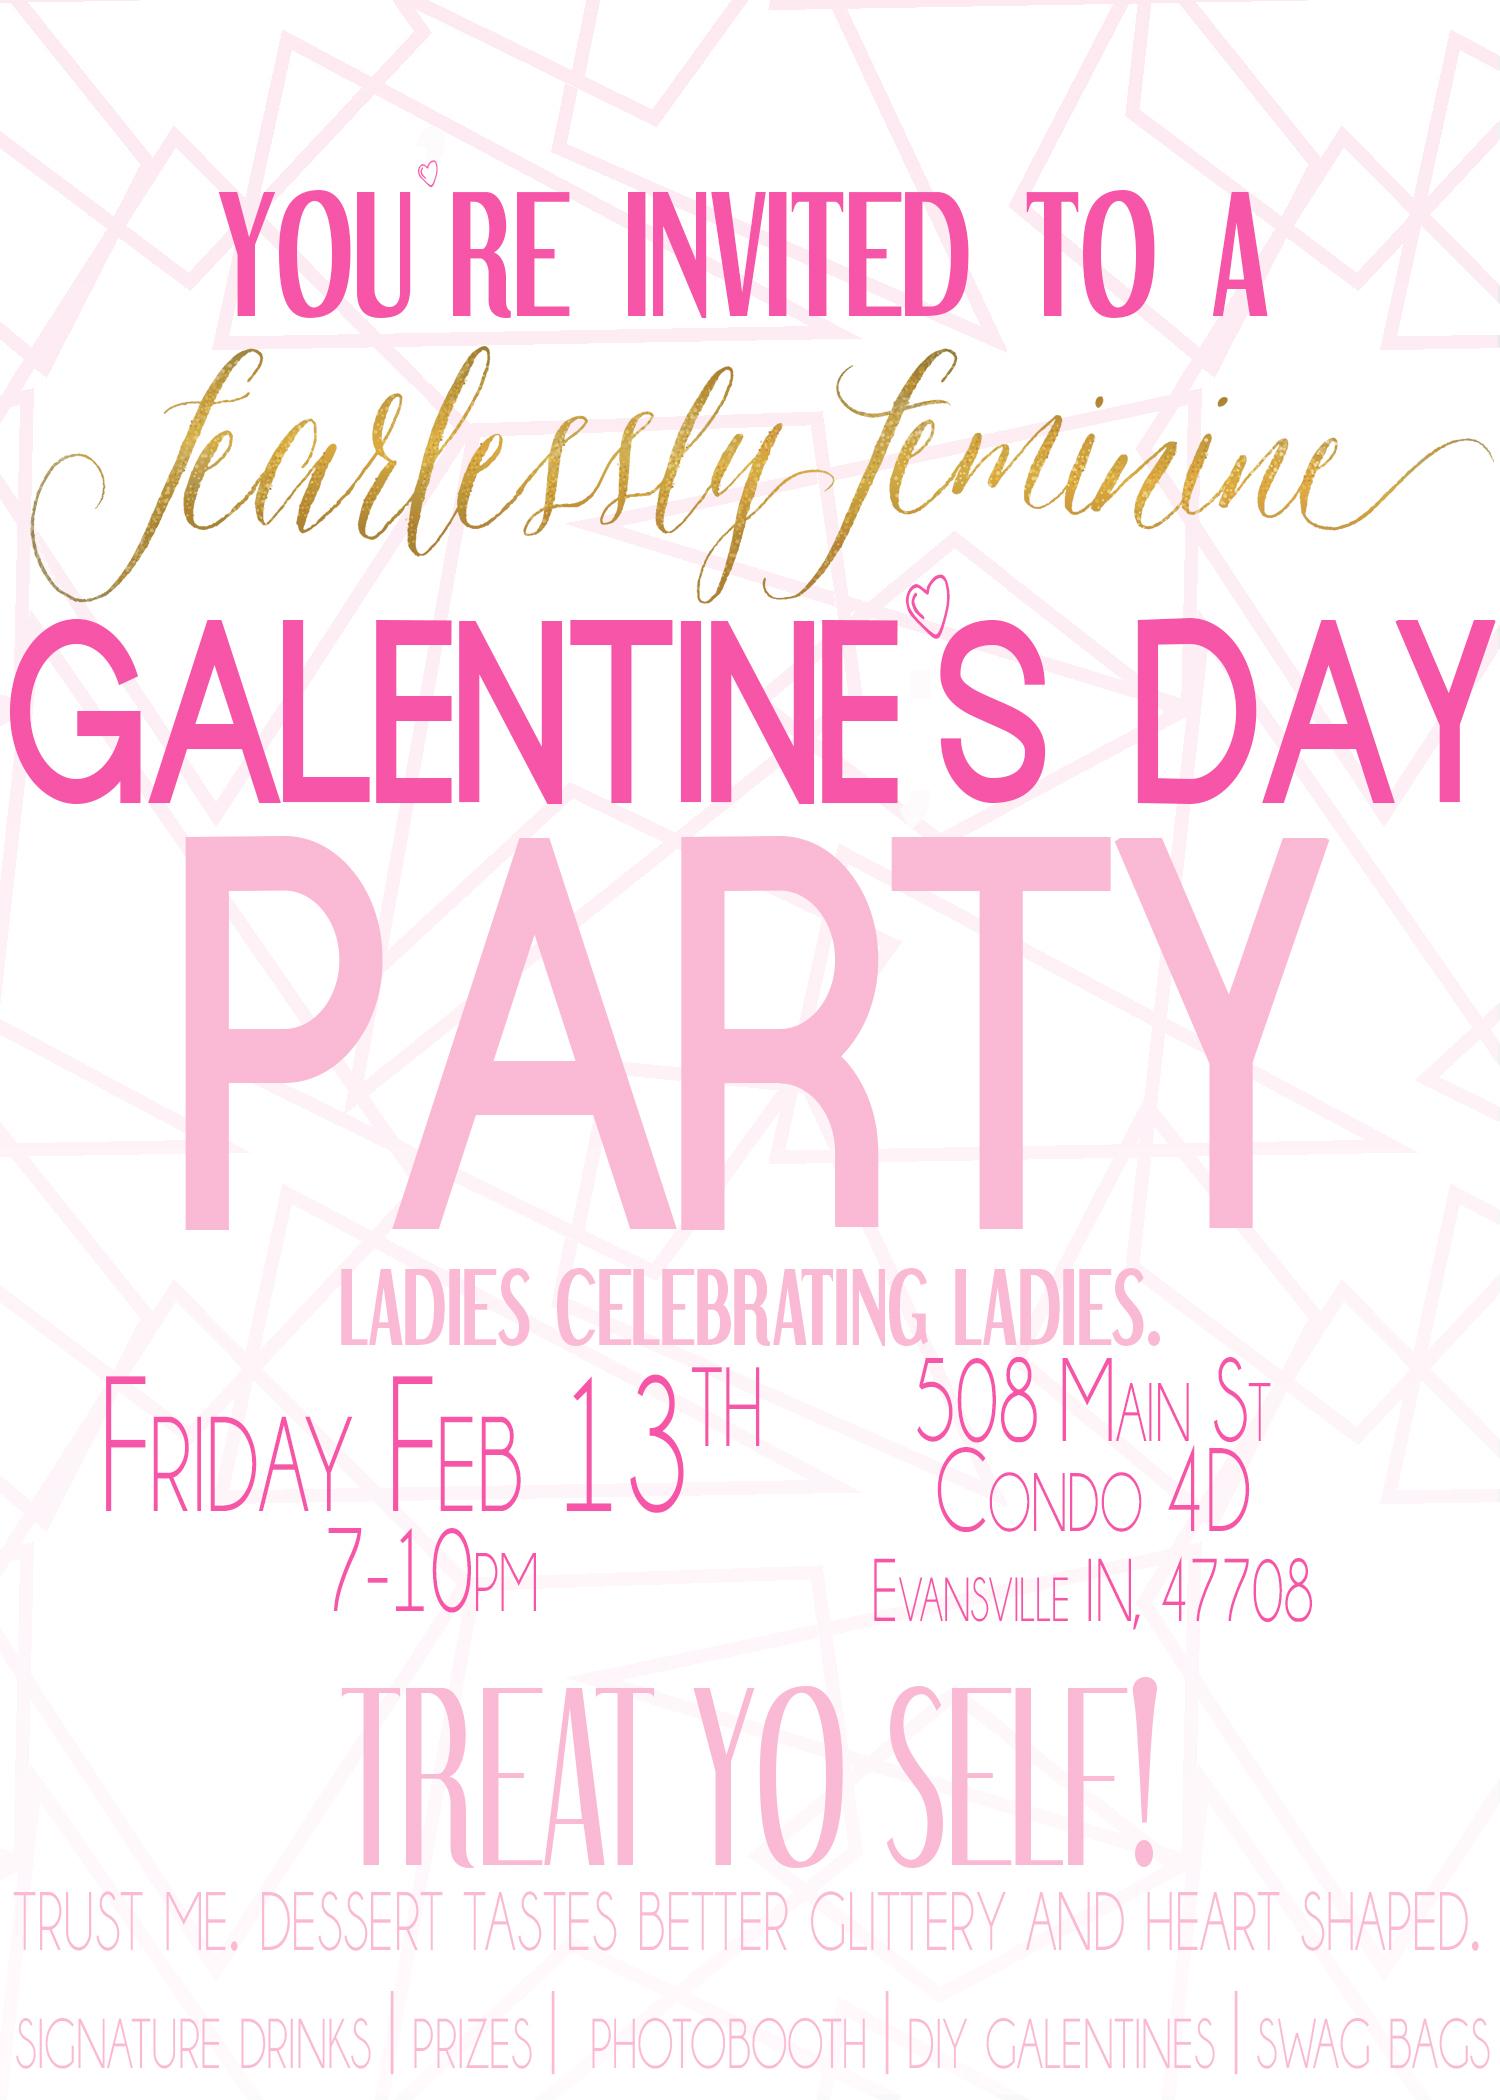 Ladies Celebrating Ladies Galentine S Day Evansville In Boudoir Photographer Fearlessly Feminine